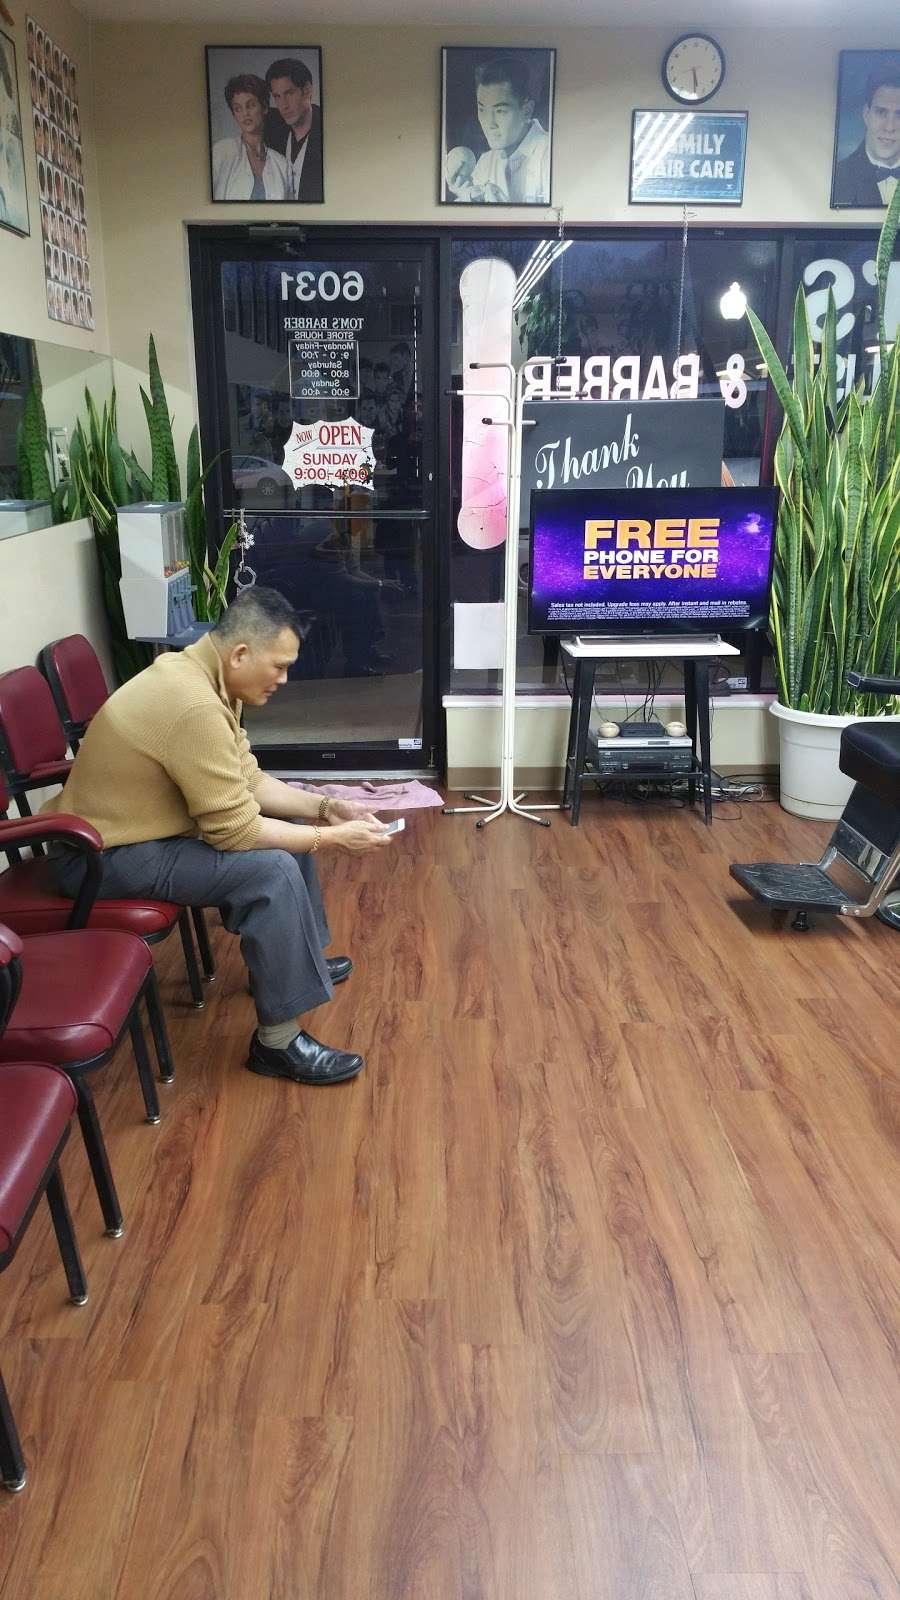 Toms Barber - hair care  | Photo 1 of 10 | Address: 6031 Wilson Blvd, Arlington, VA 22205, USA | Phone: (703) 241-1335